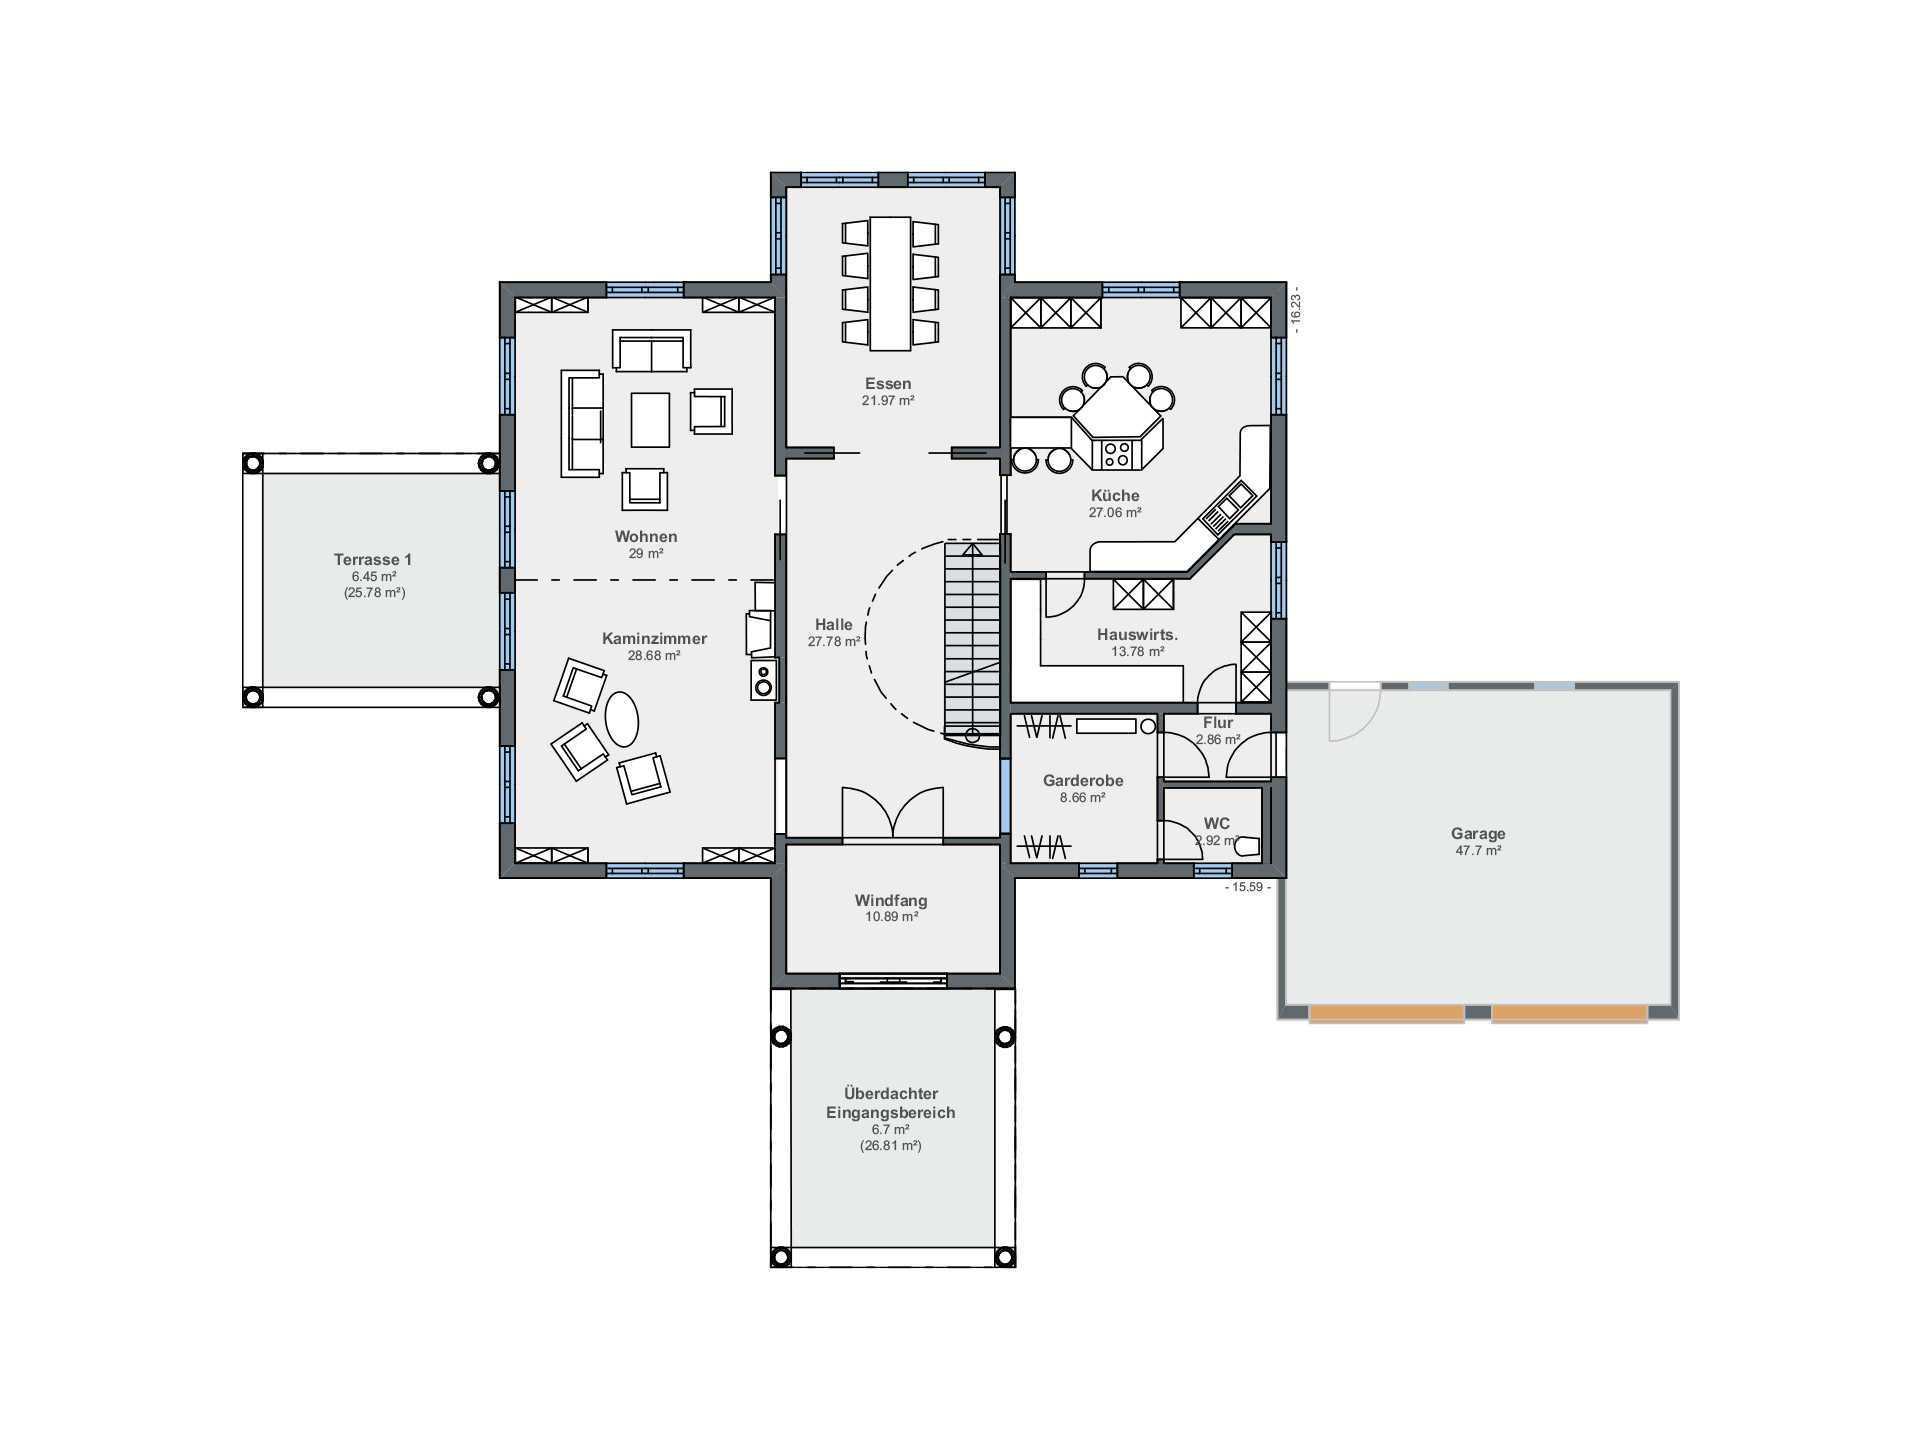 traumvilla bauforum rheinau linx weberhaus. Black Bedroom Furniture Sets. Home Design Ideas